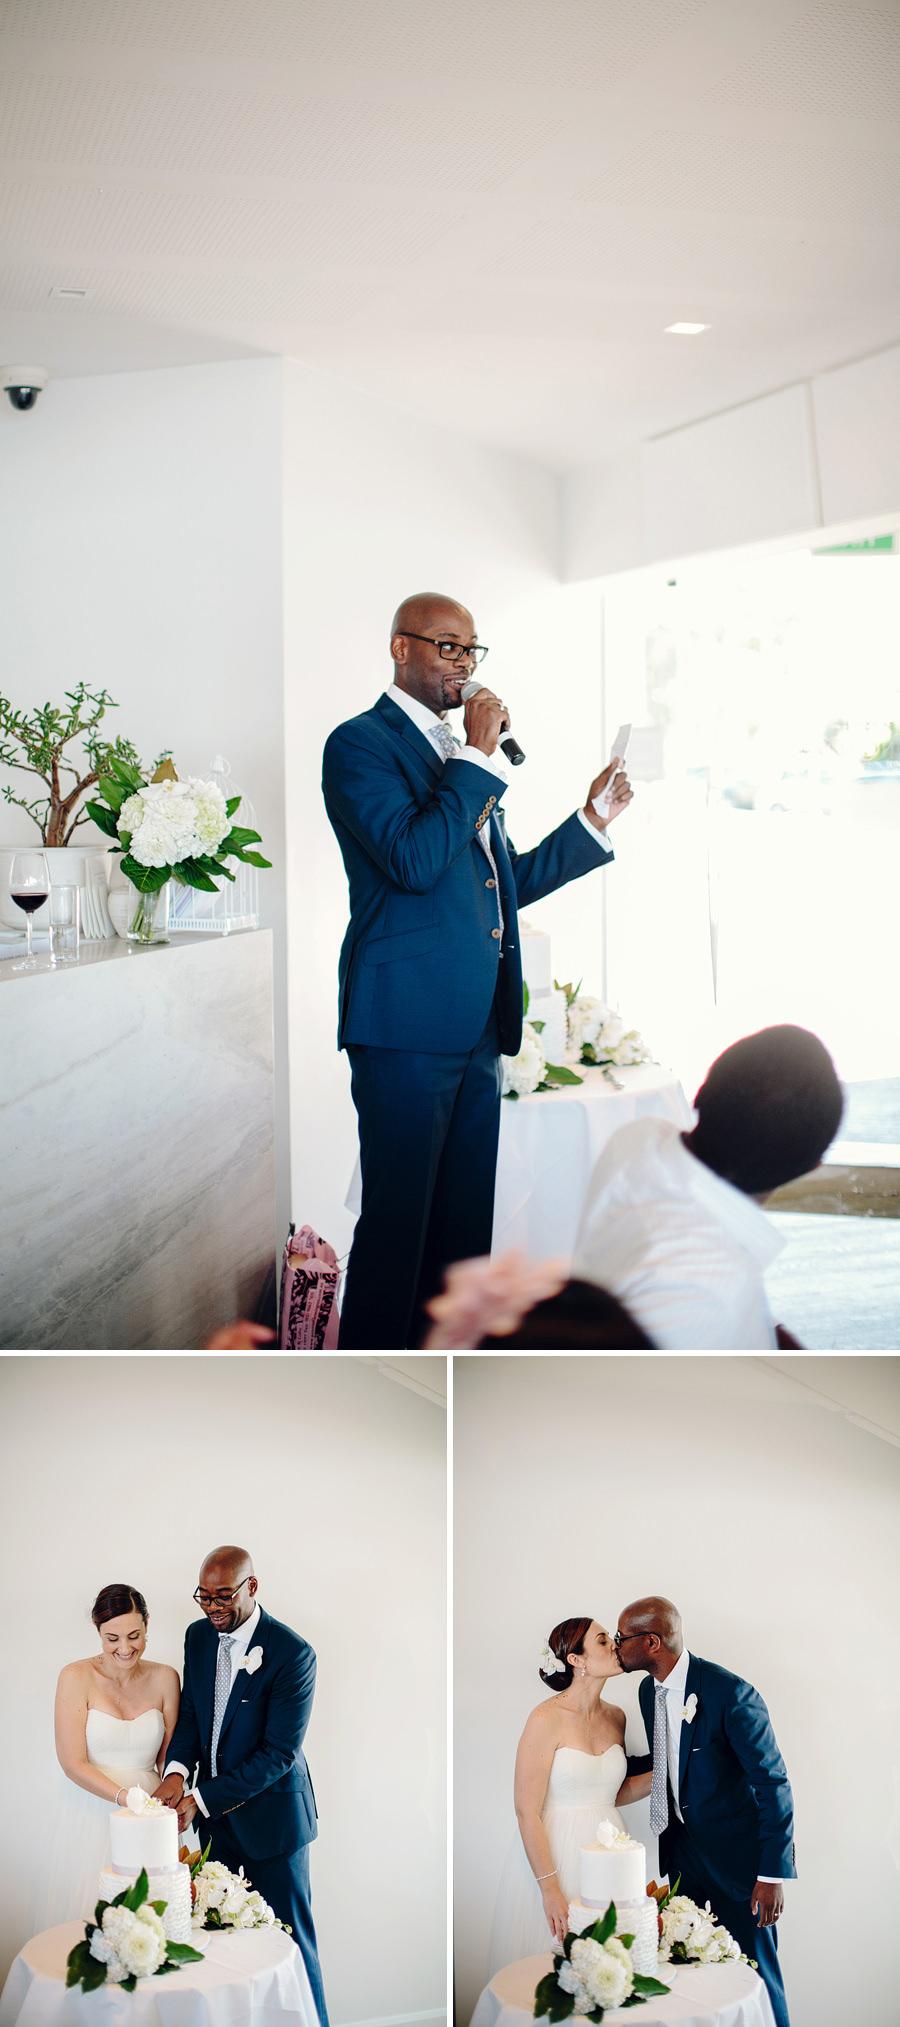 Elegant Wedding Photographer: Groom speech